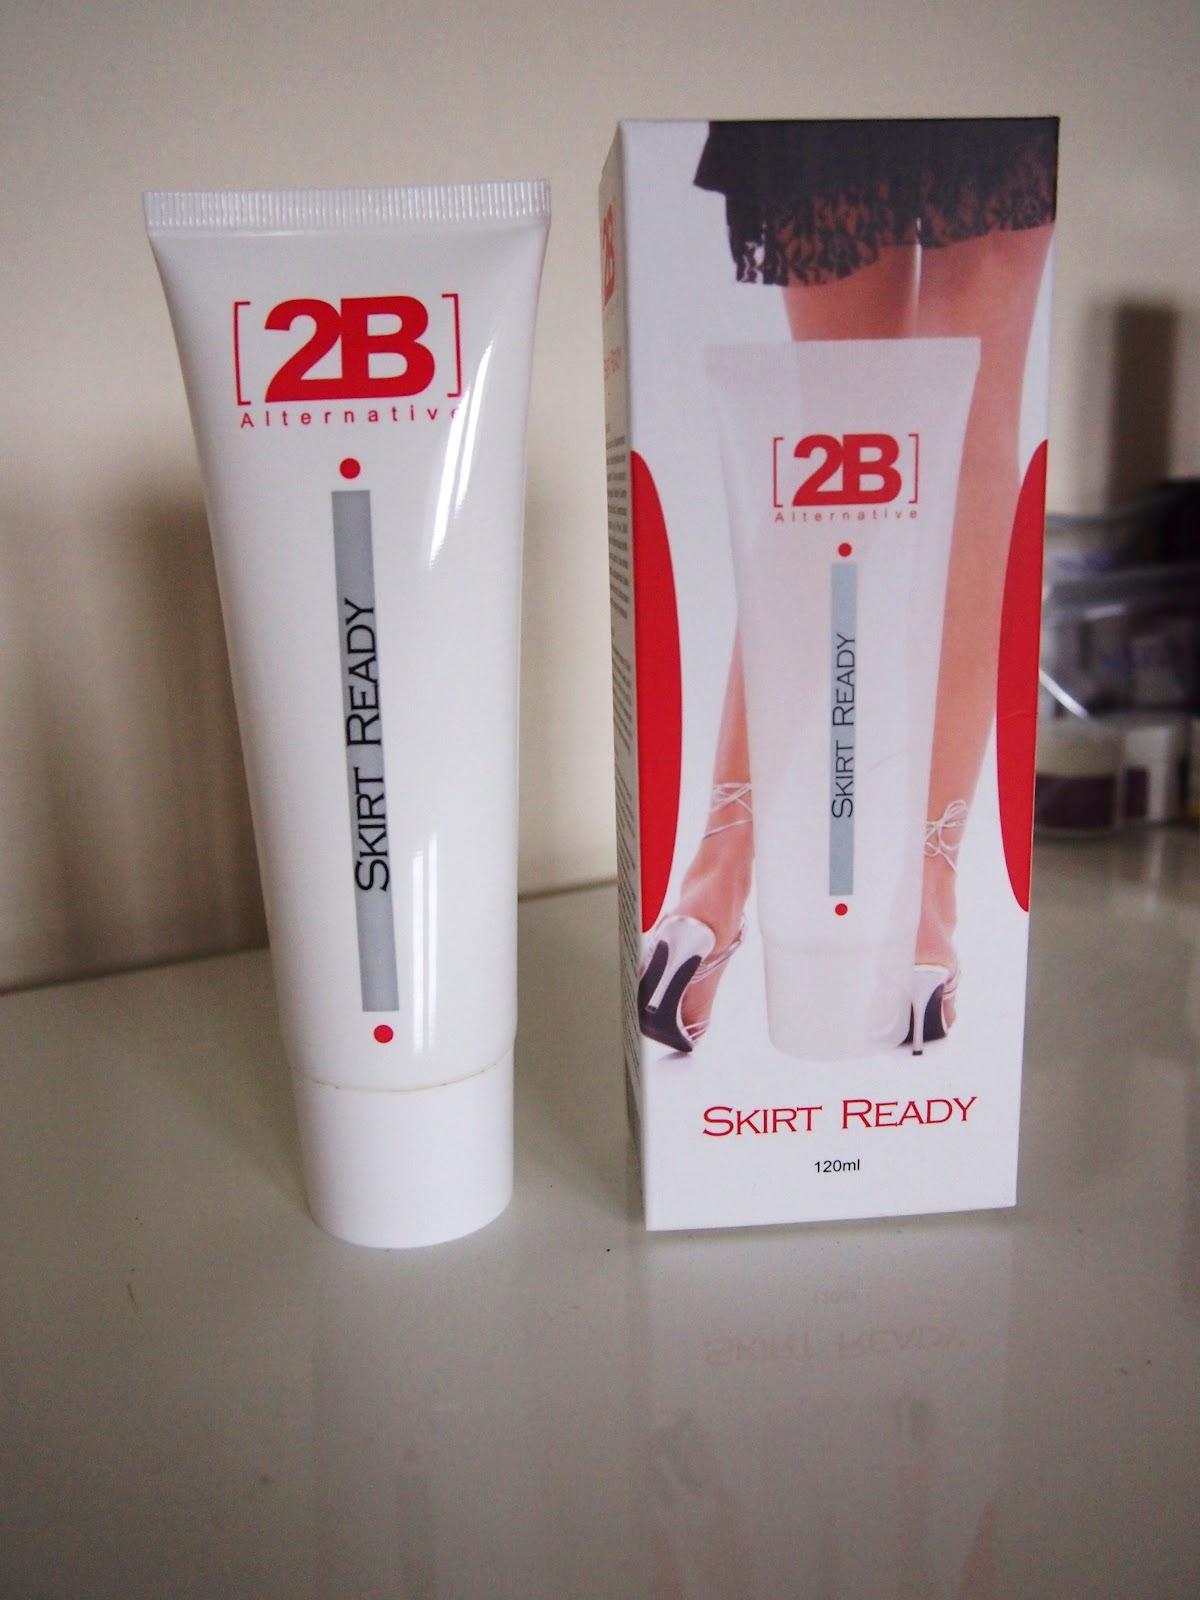 2b review slimming leg